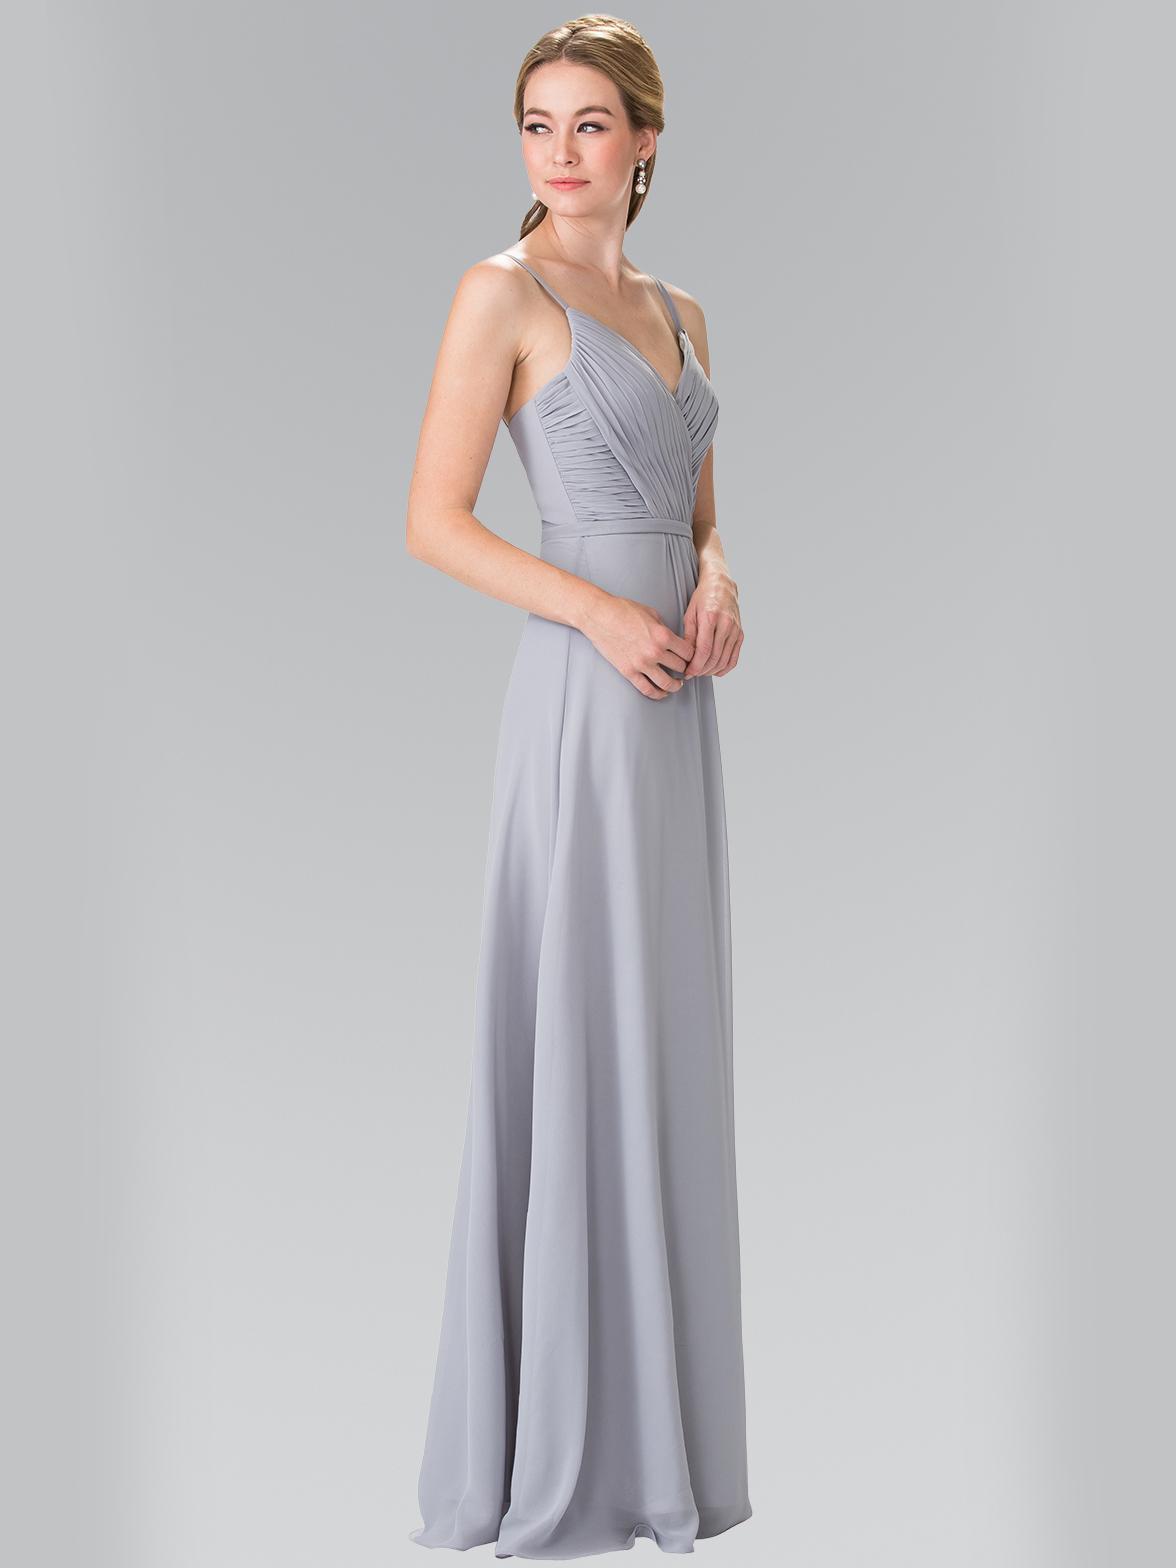 chiffon bridesmaid dress with spaghetti straps